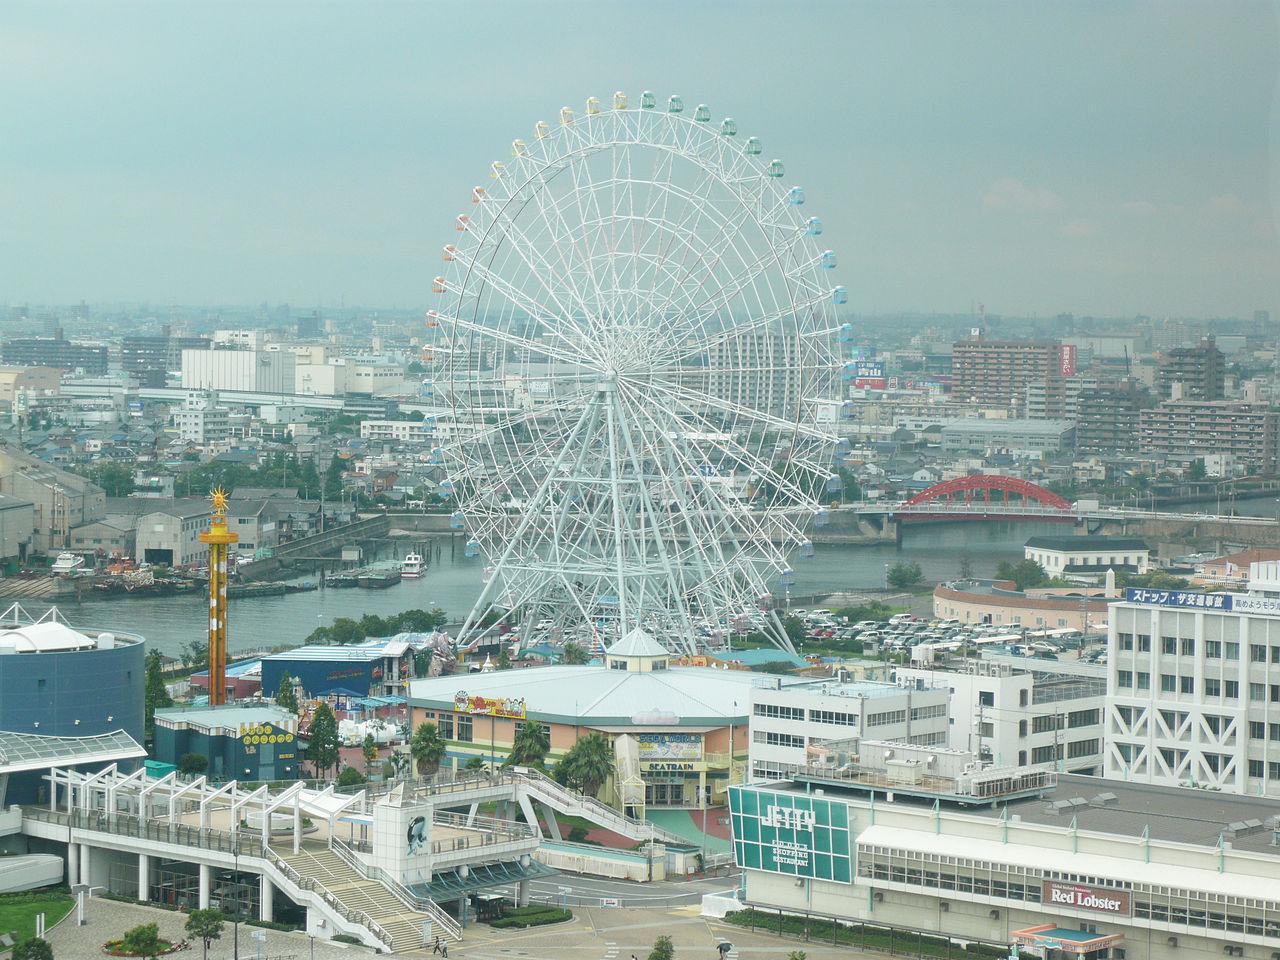 File:Ferris Wheel - Port of Nagoya.JPG - Wikimedia Commons